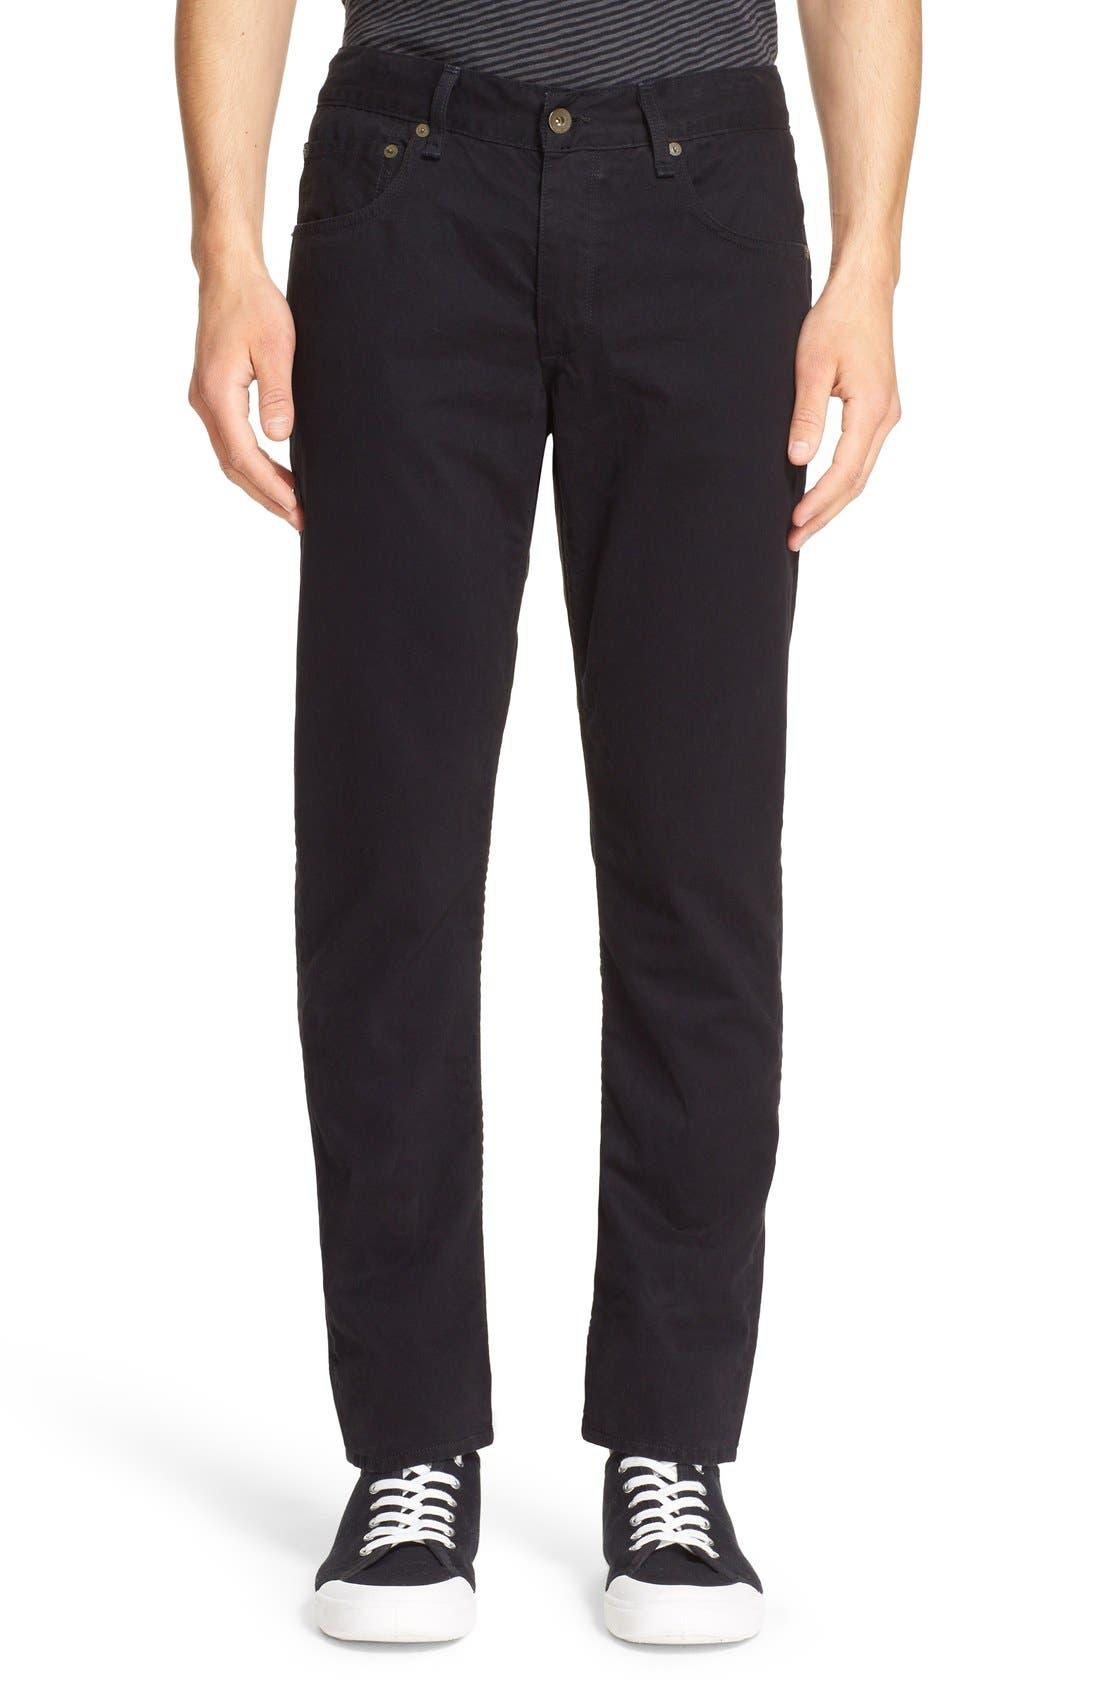 'Fit 2' Cotton Twill Pants,                             Main thumbnail 1, color,                             Black